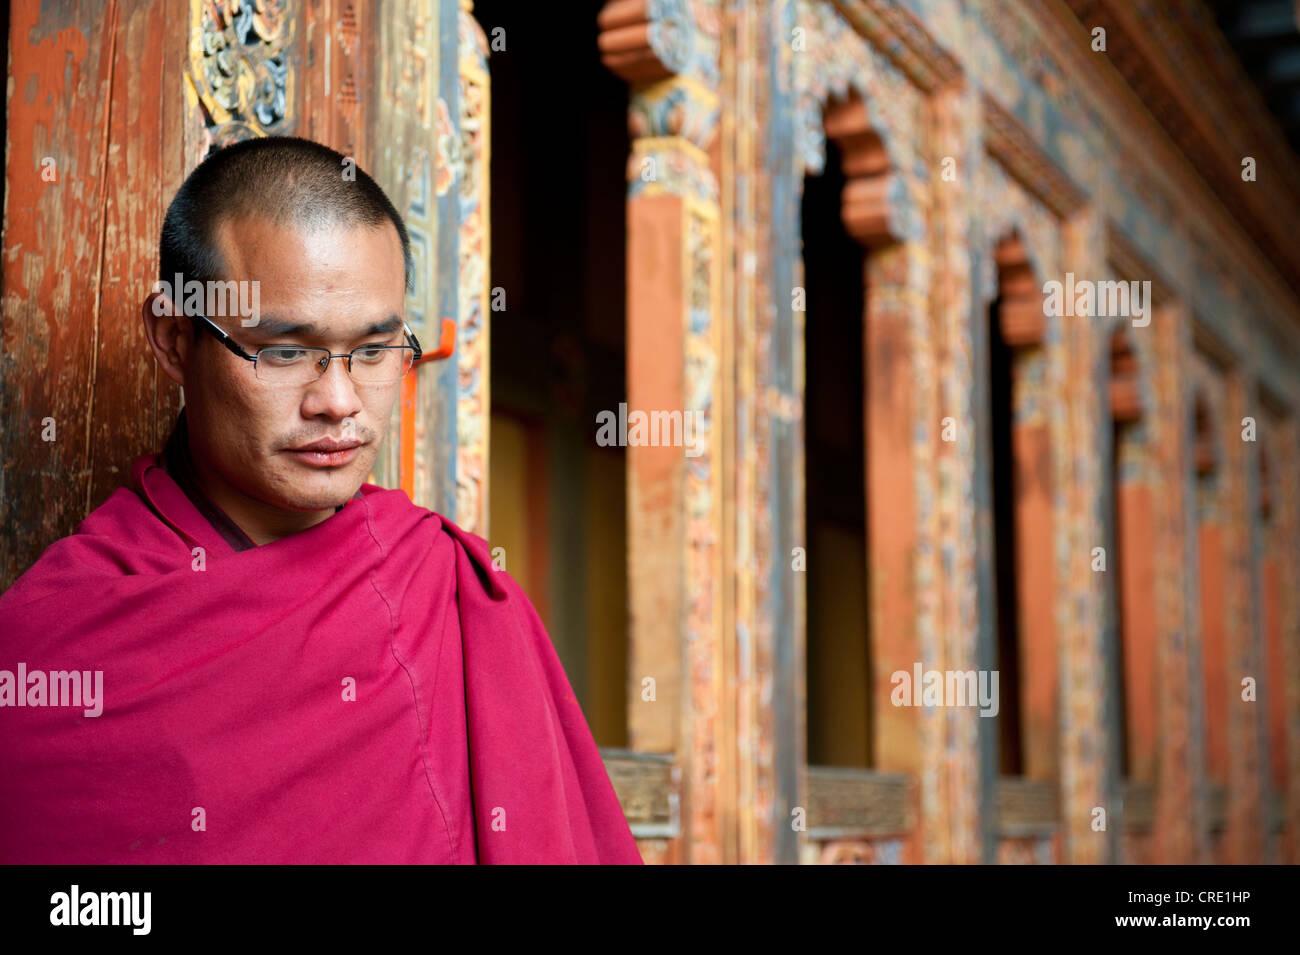 Tibetan Buddhism, monk in a red robe, ornate wooden wall, Tango Goemba Monastery, near Thimphu, the Himalayas, Kingdom - Stock Image